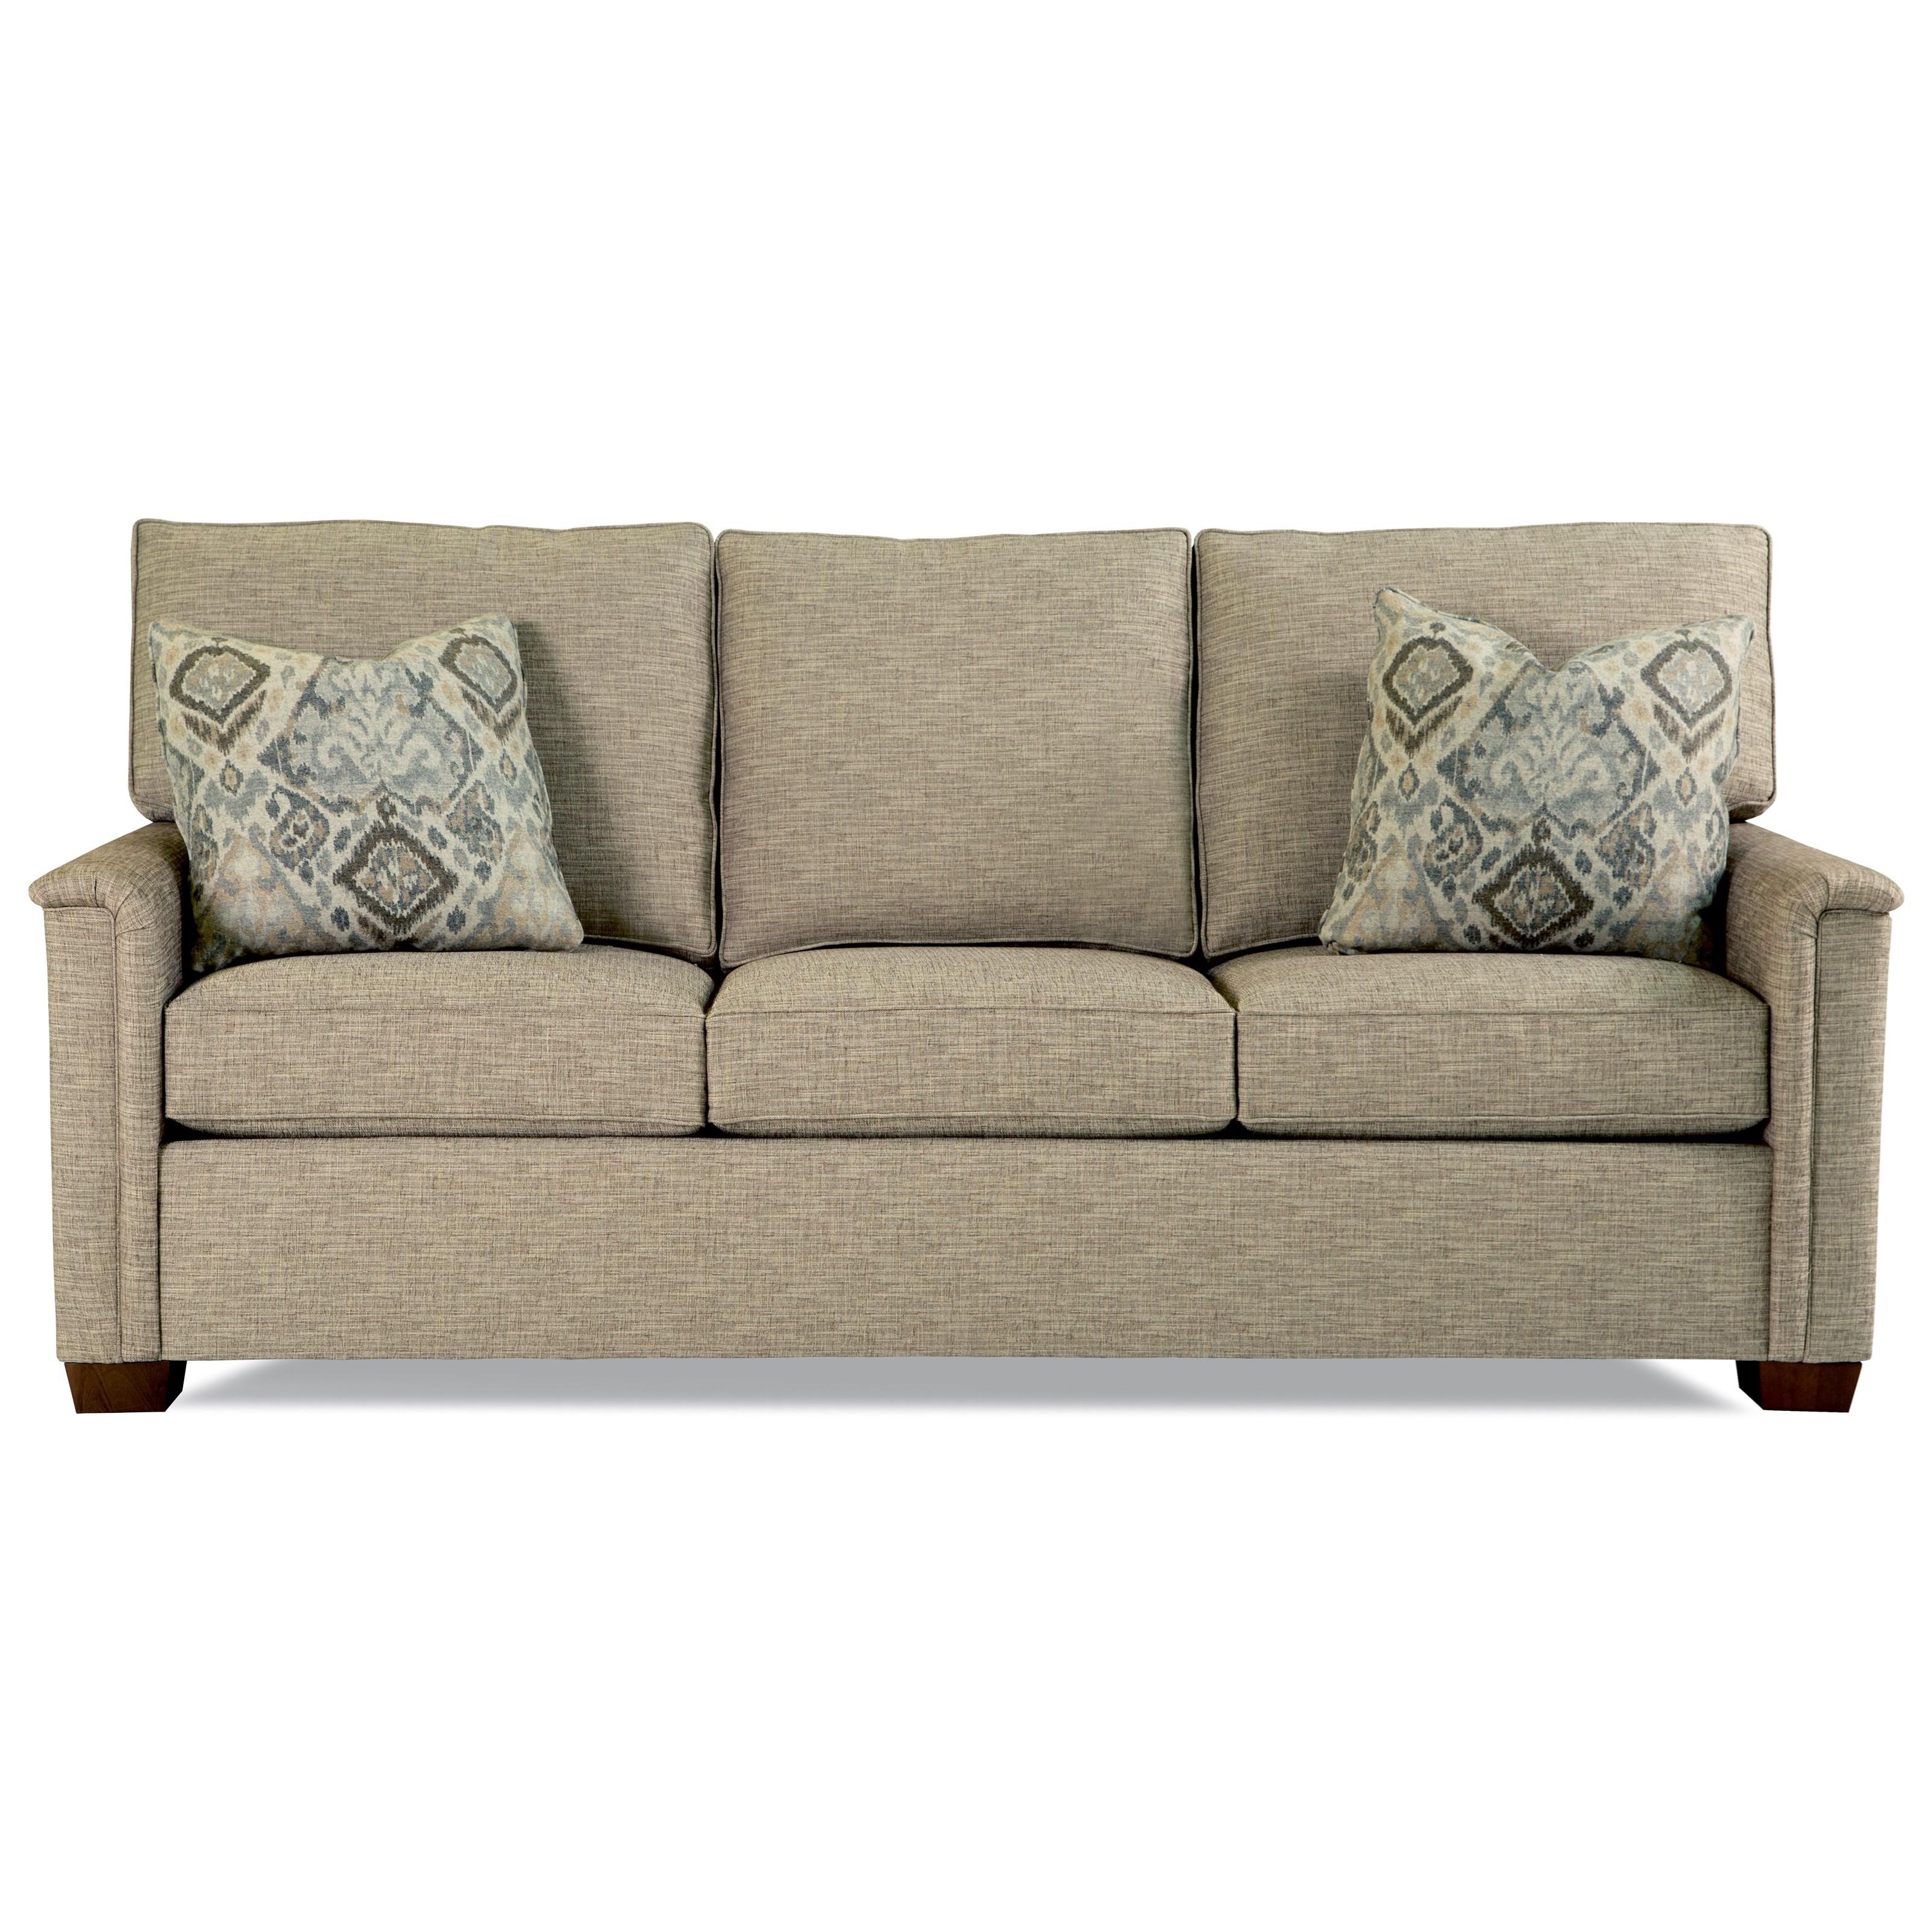 2800 Customizable Sofa by Huntington House at Belfort Furniture